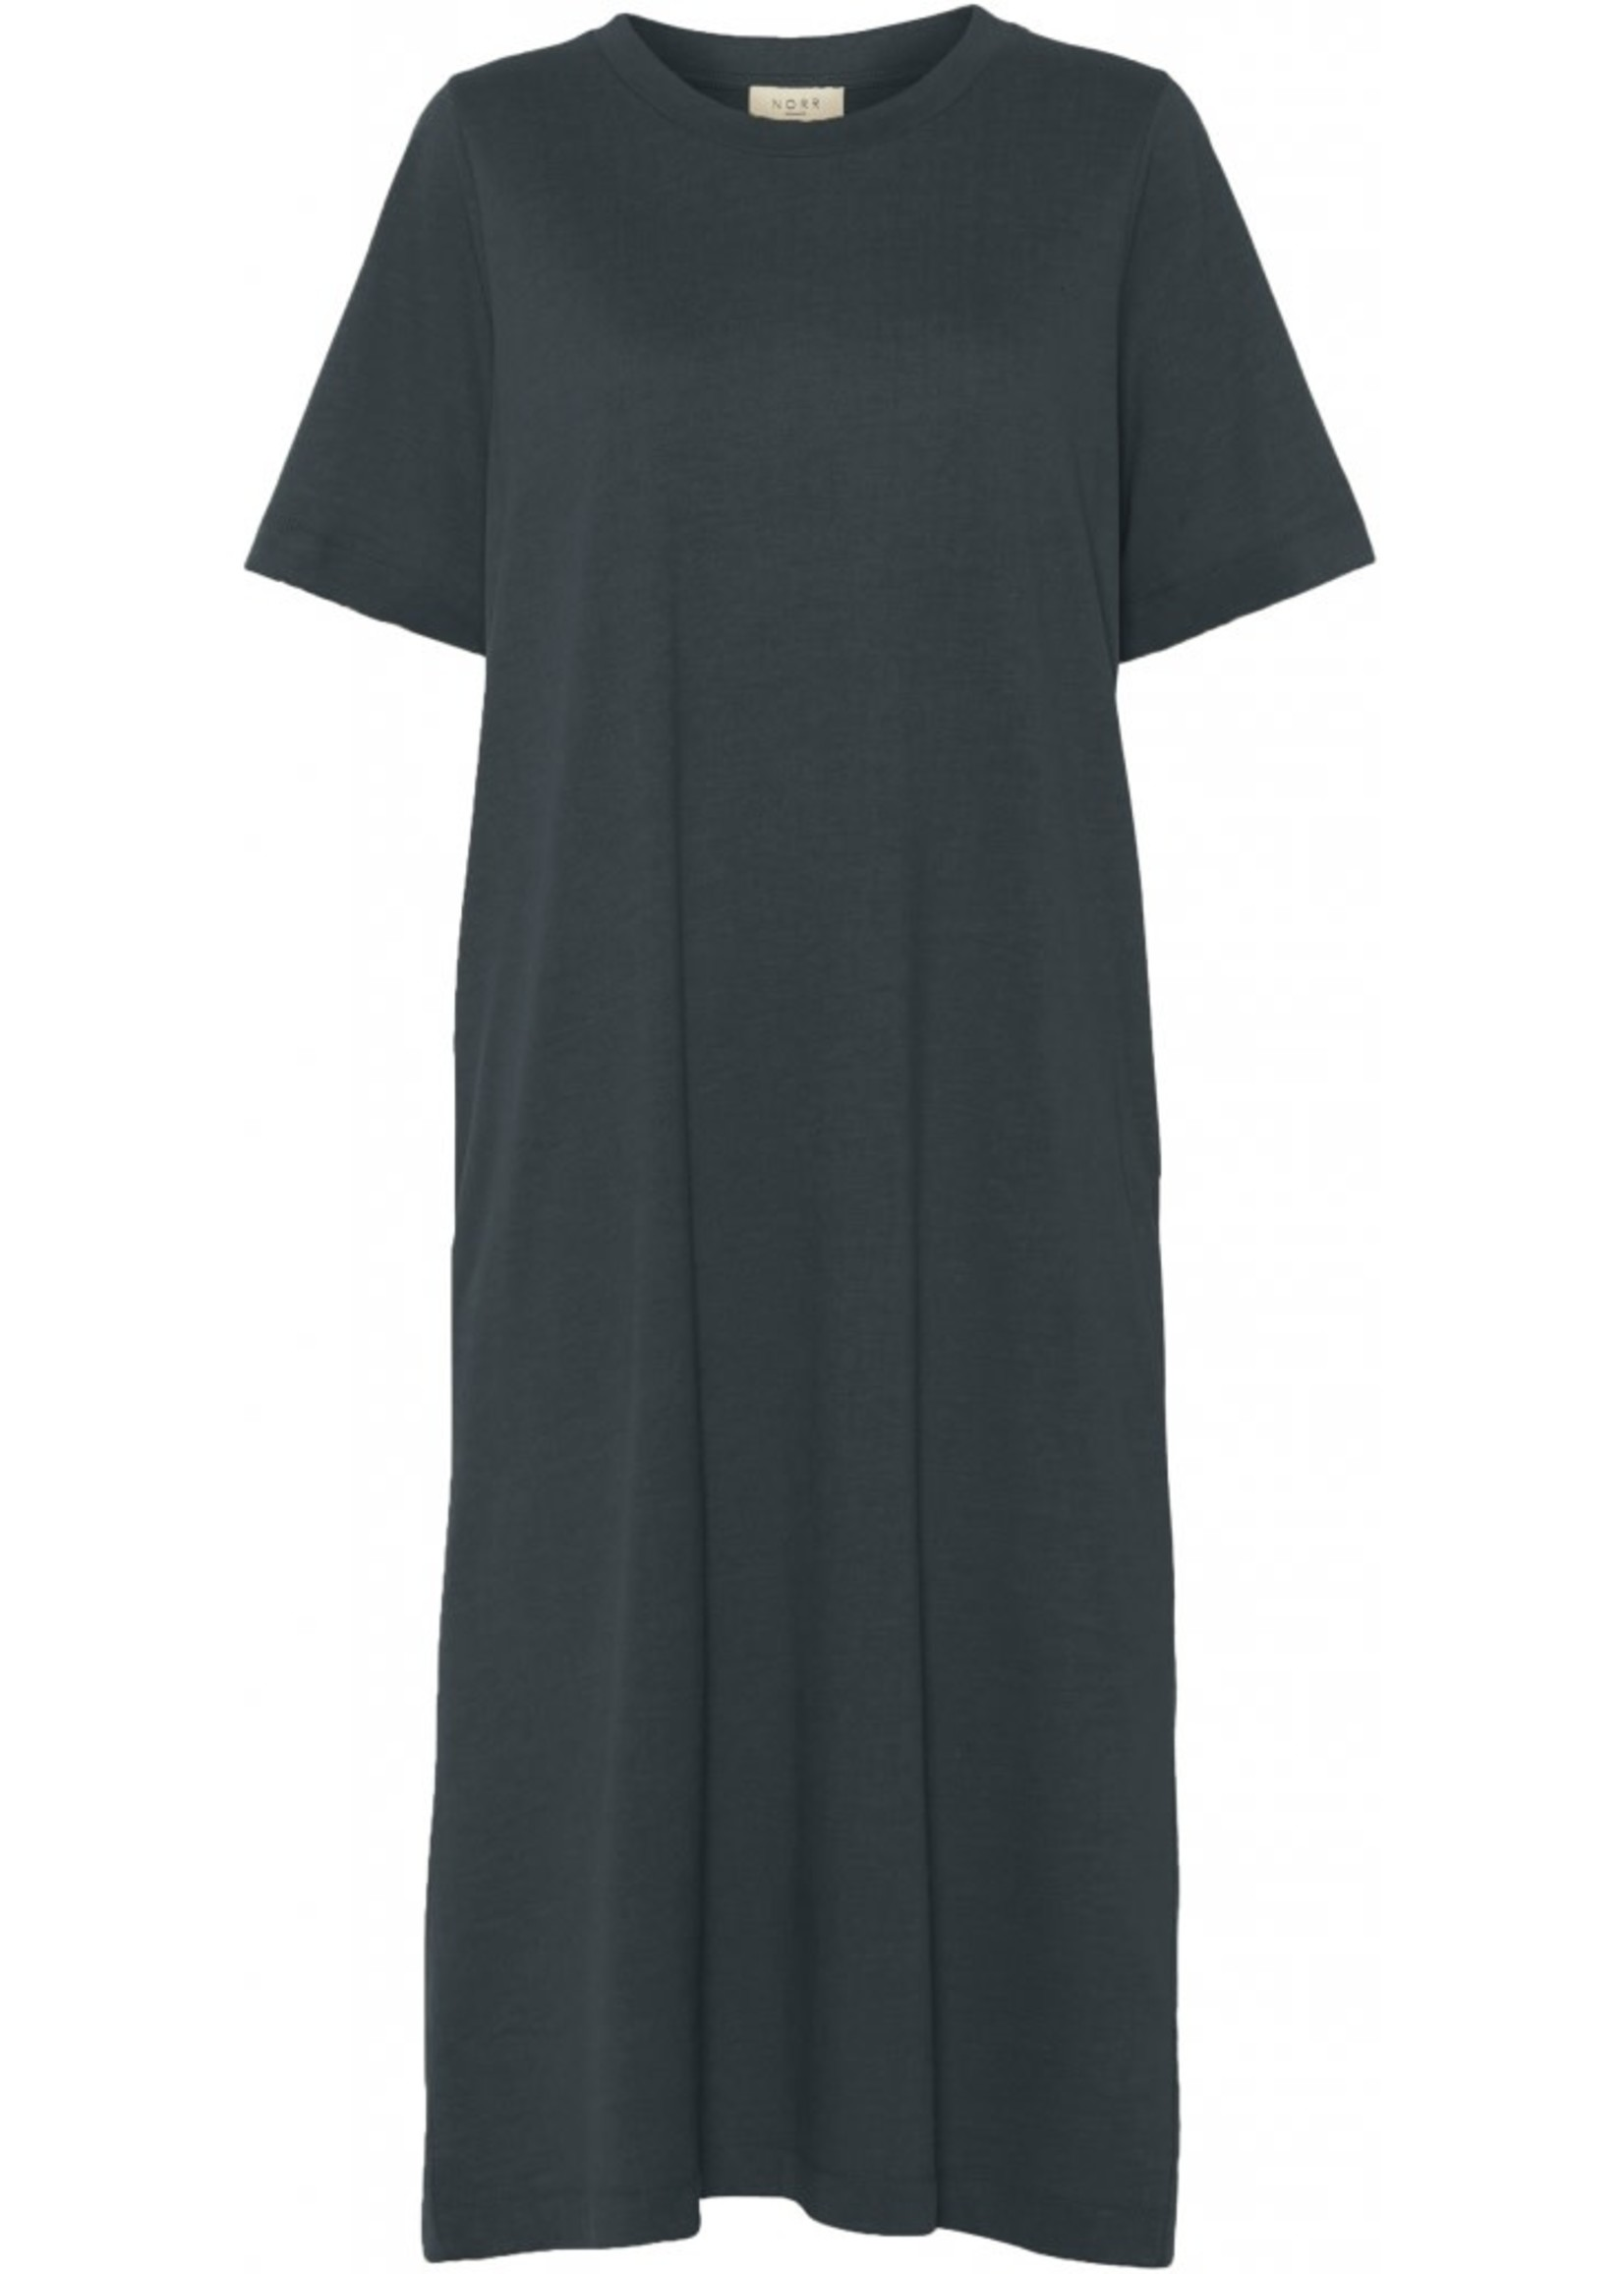 Norr Payton tee dress